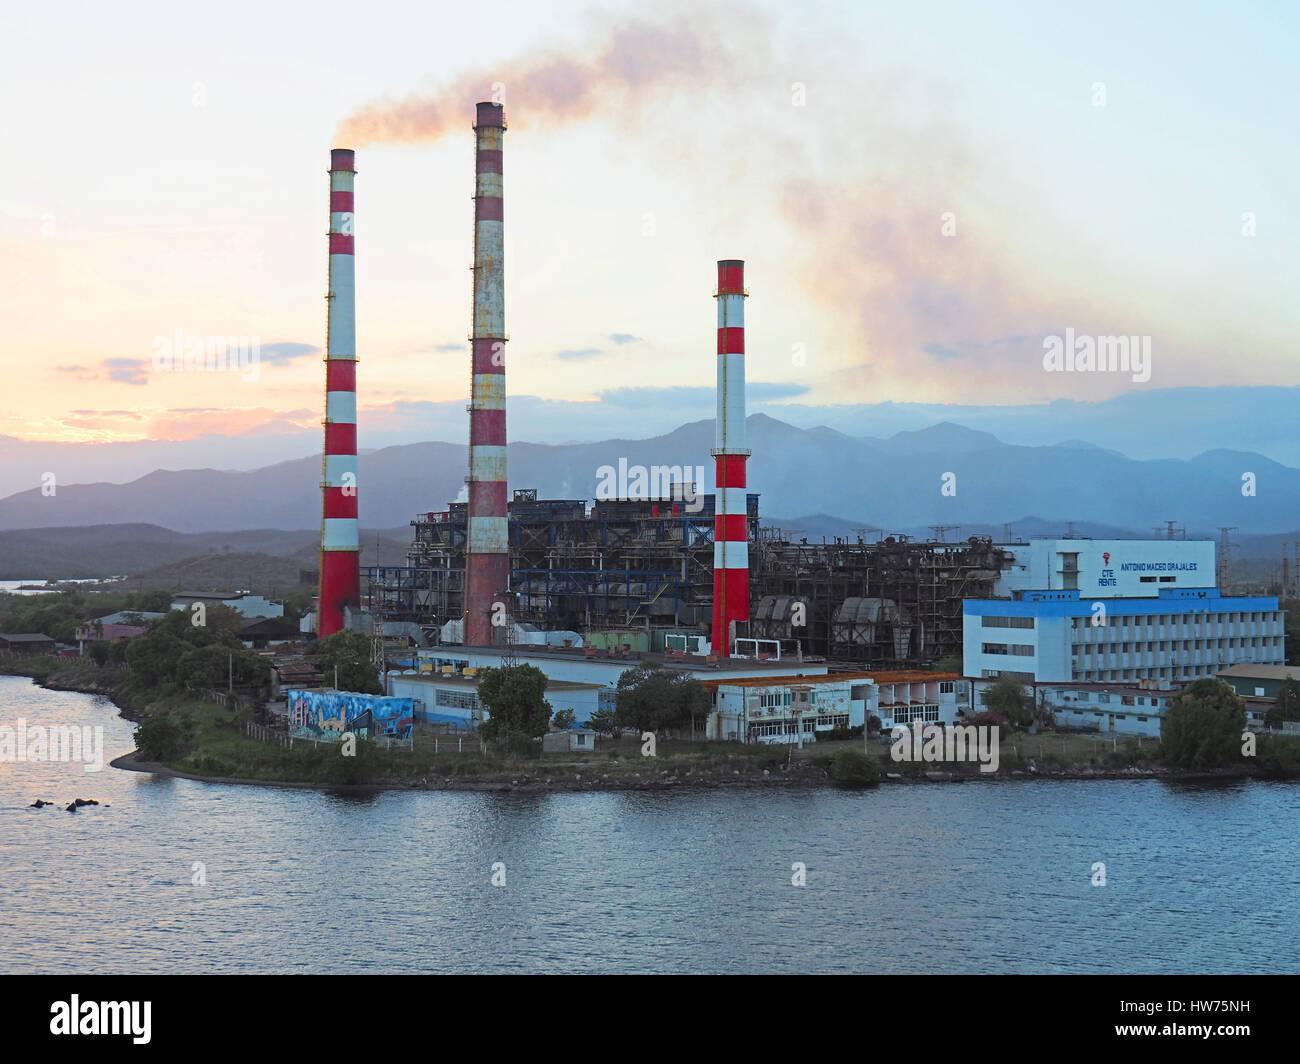 Refinery at Santiago de Cuba with air pollution problem. - Stock Image